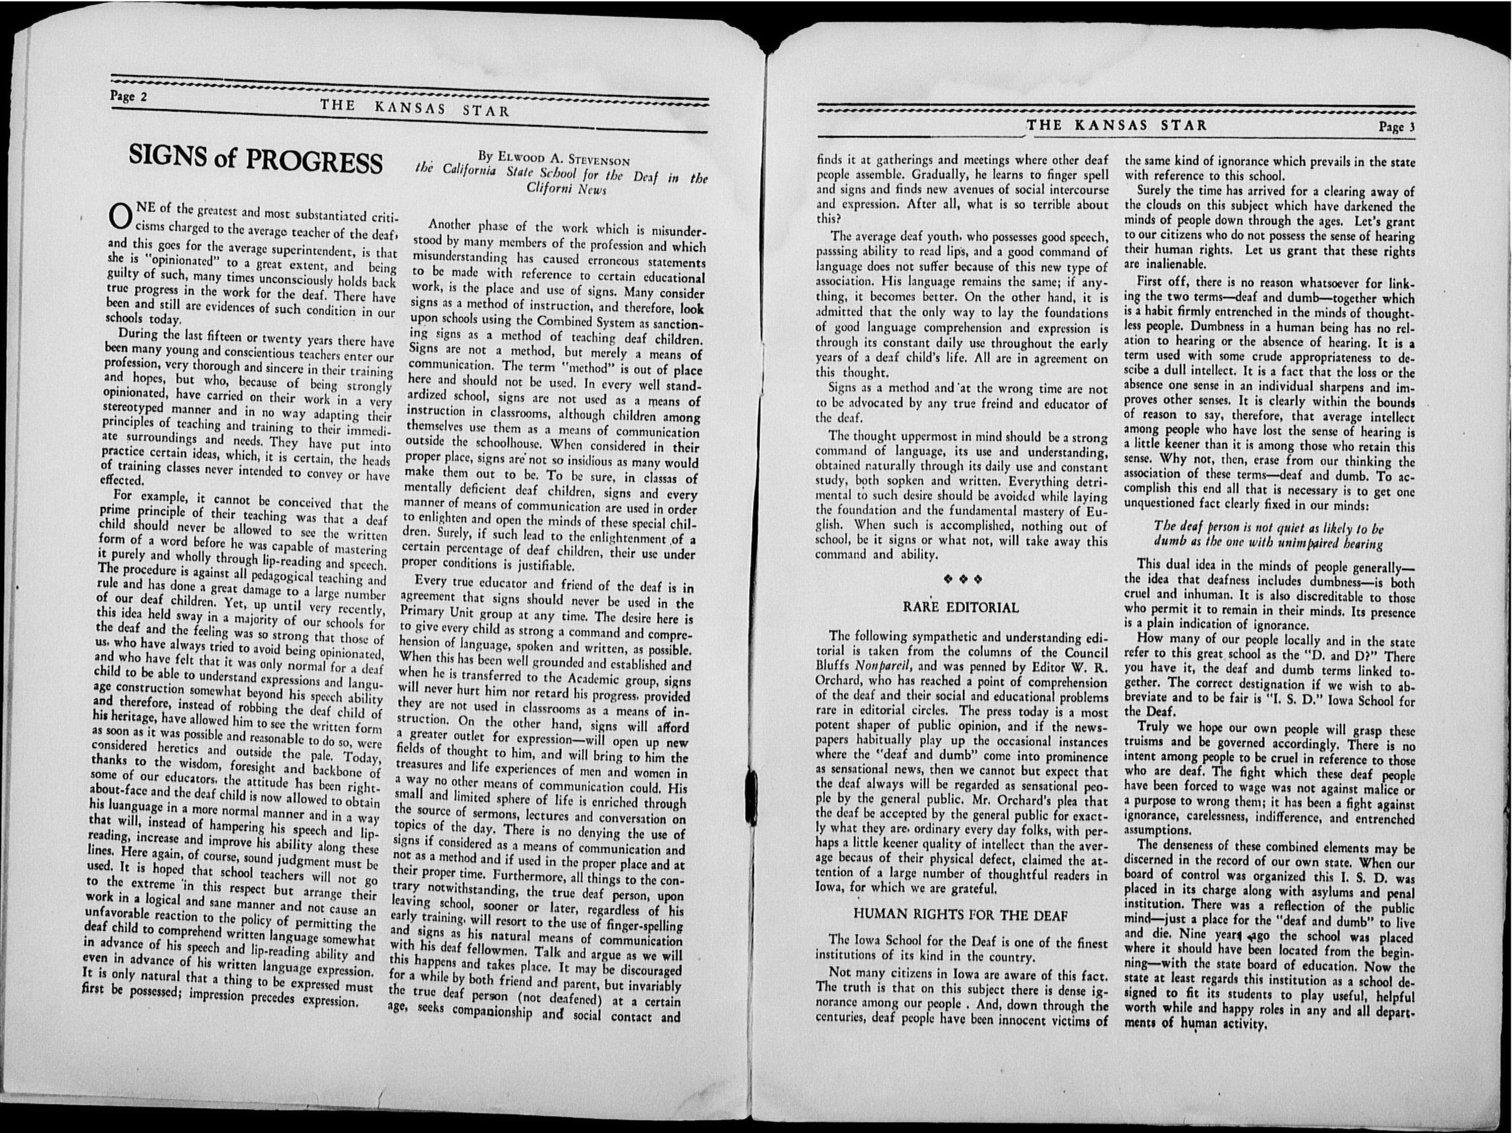 The Kansas Star, volume 44, number 2 - 2-3